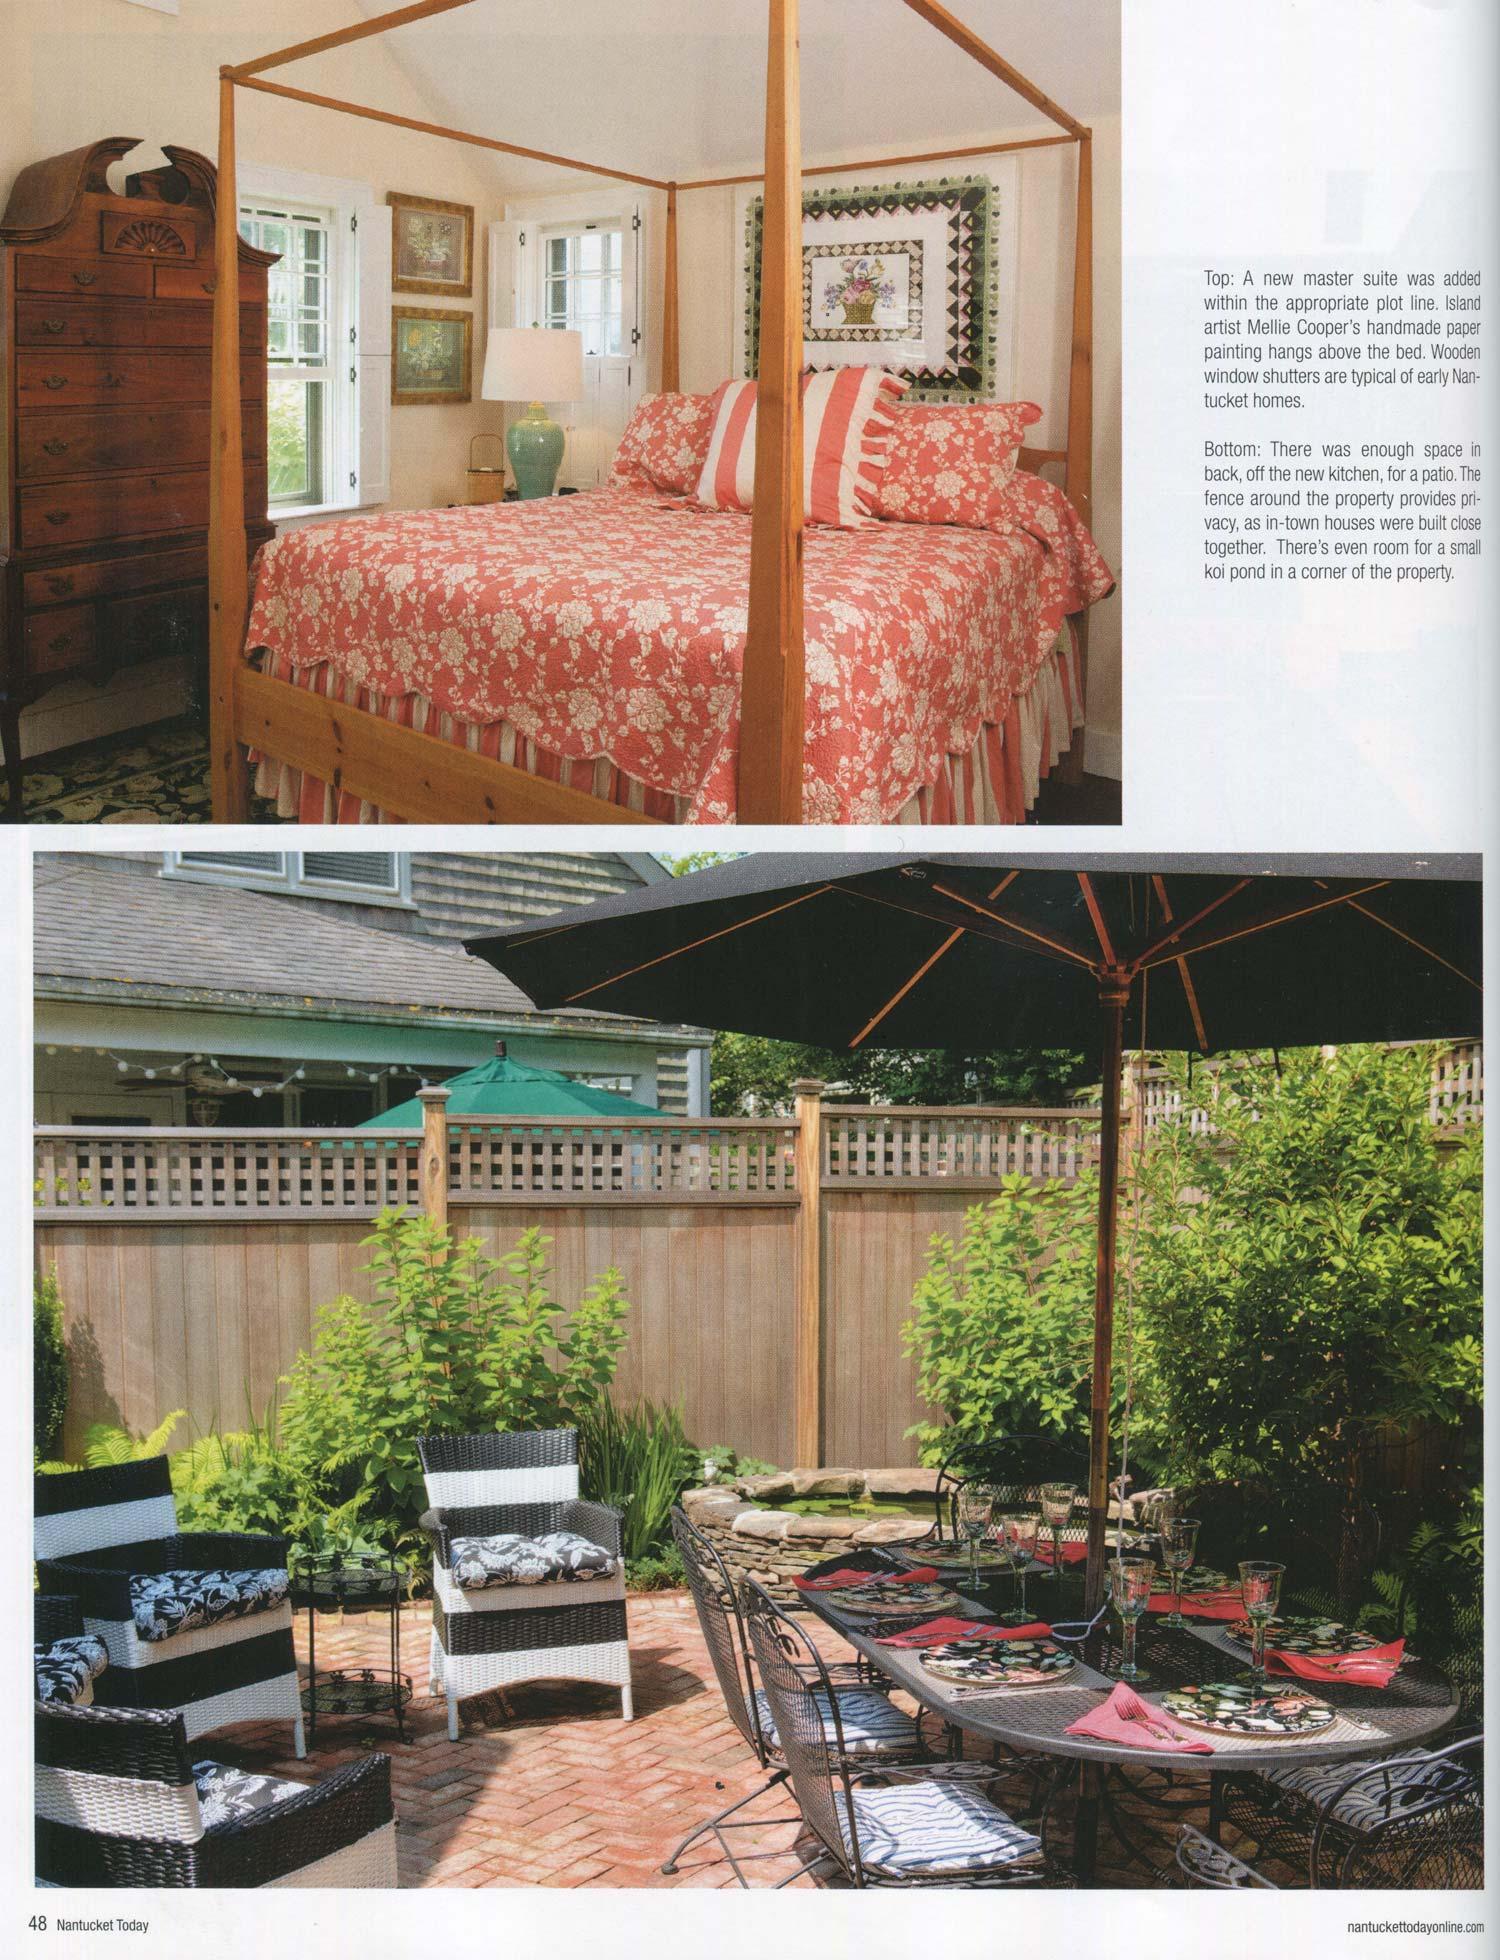 Nantucket Today 2015 | The Christopher Swain House | Design Associates